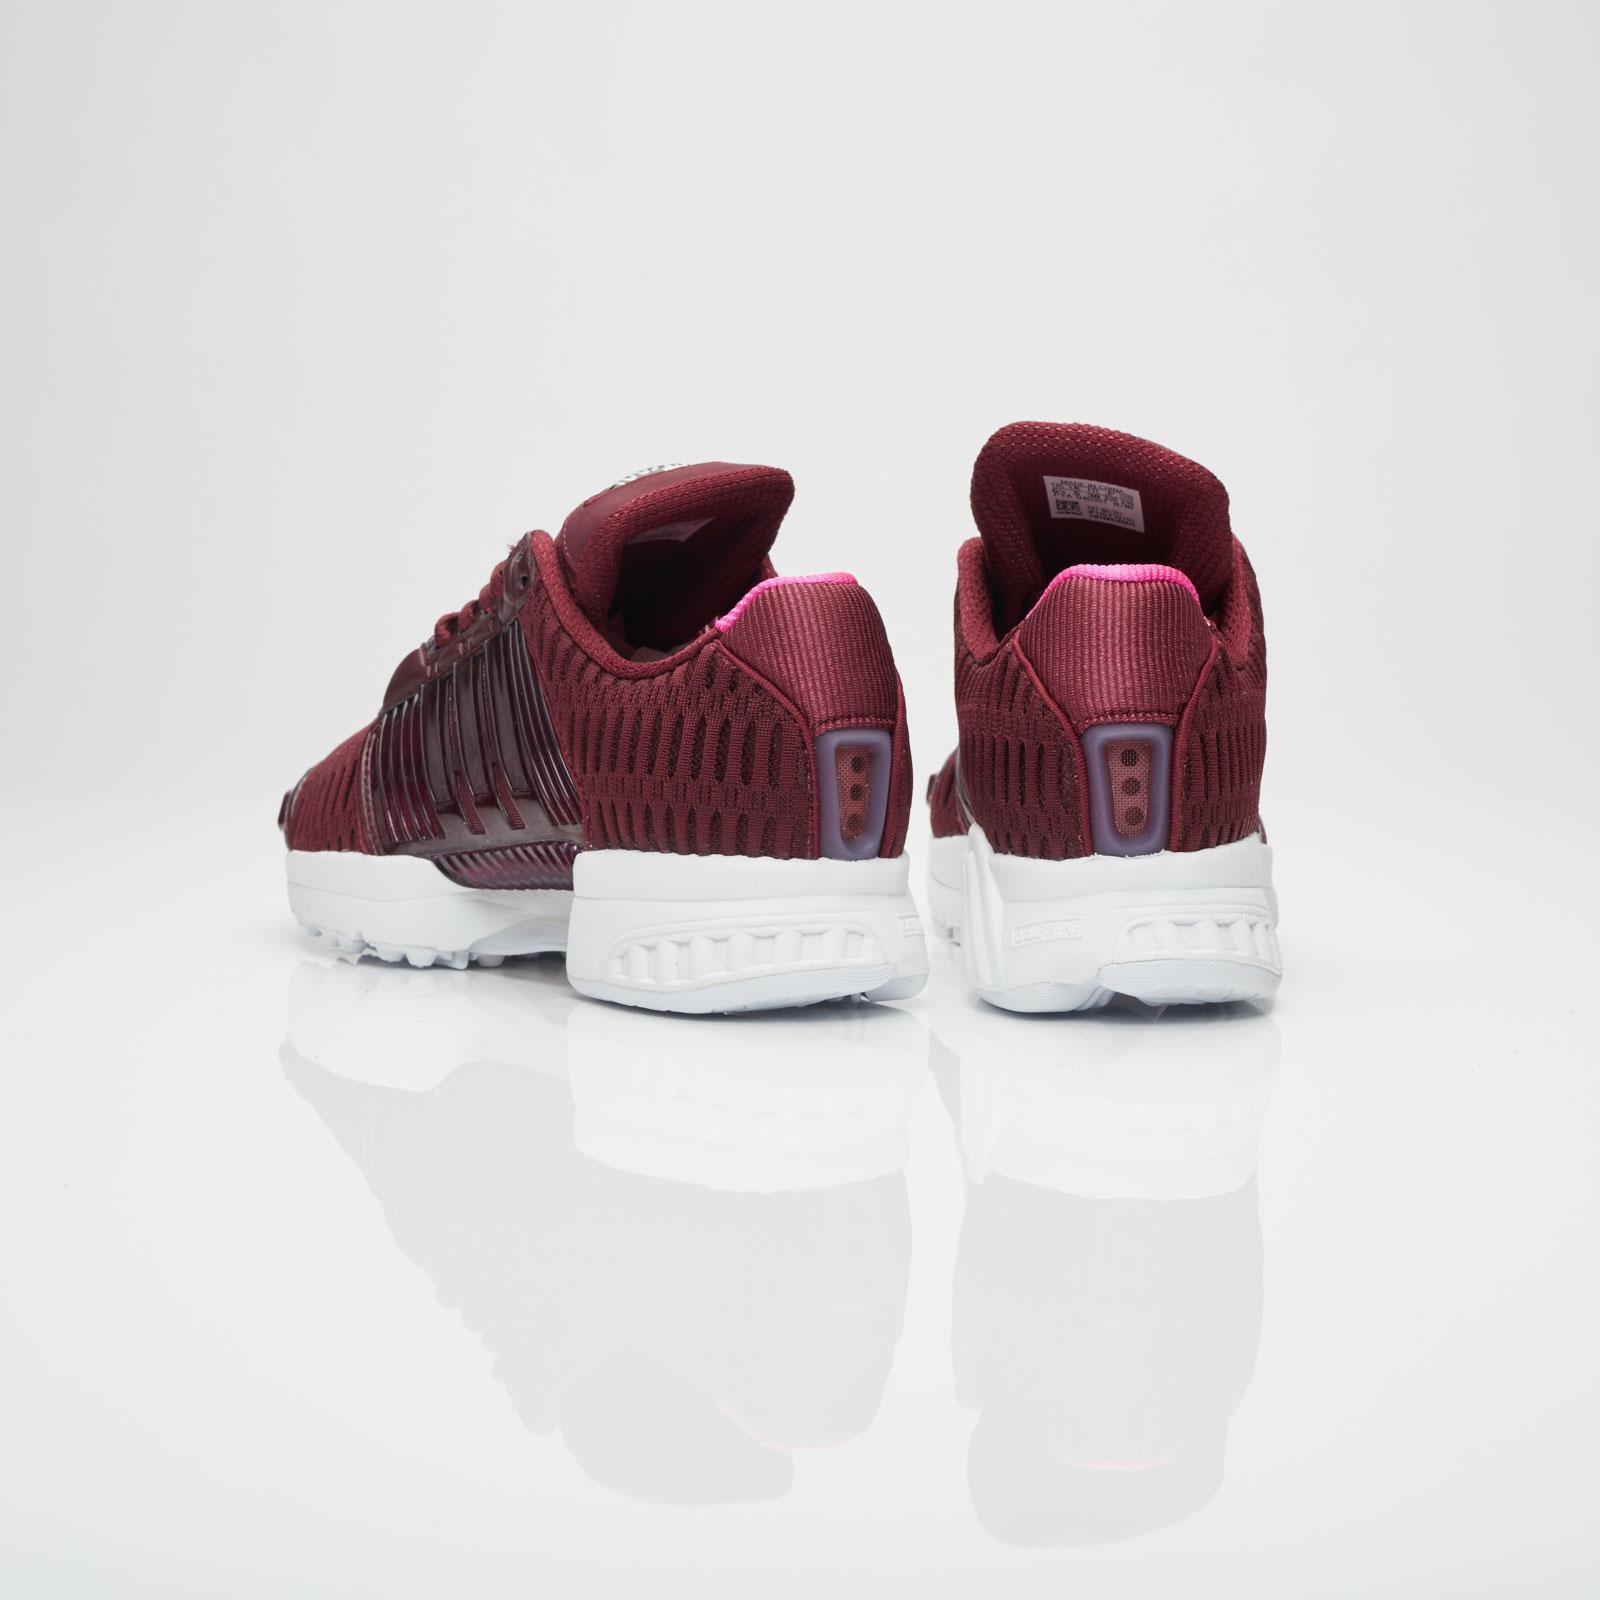 separation shoes c97ca cf174 adidas Originals Climacool 1 W adidas Originals Climacool 1 W ...